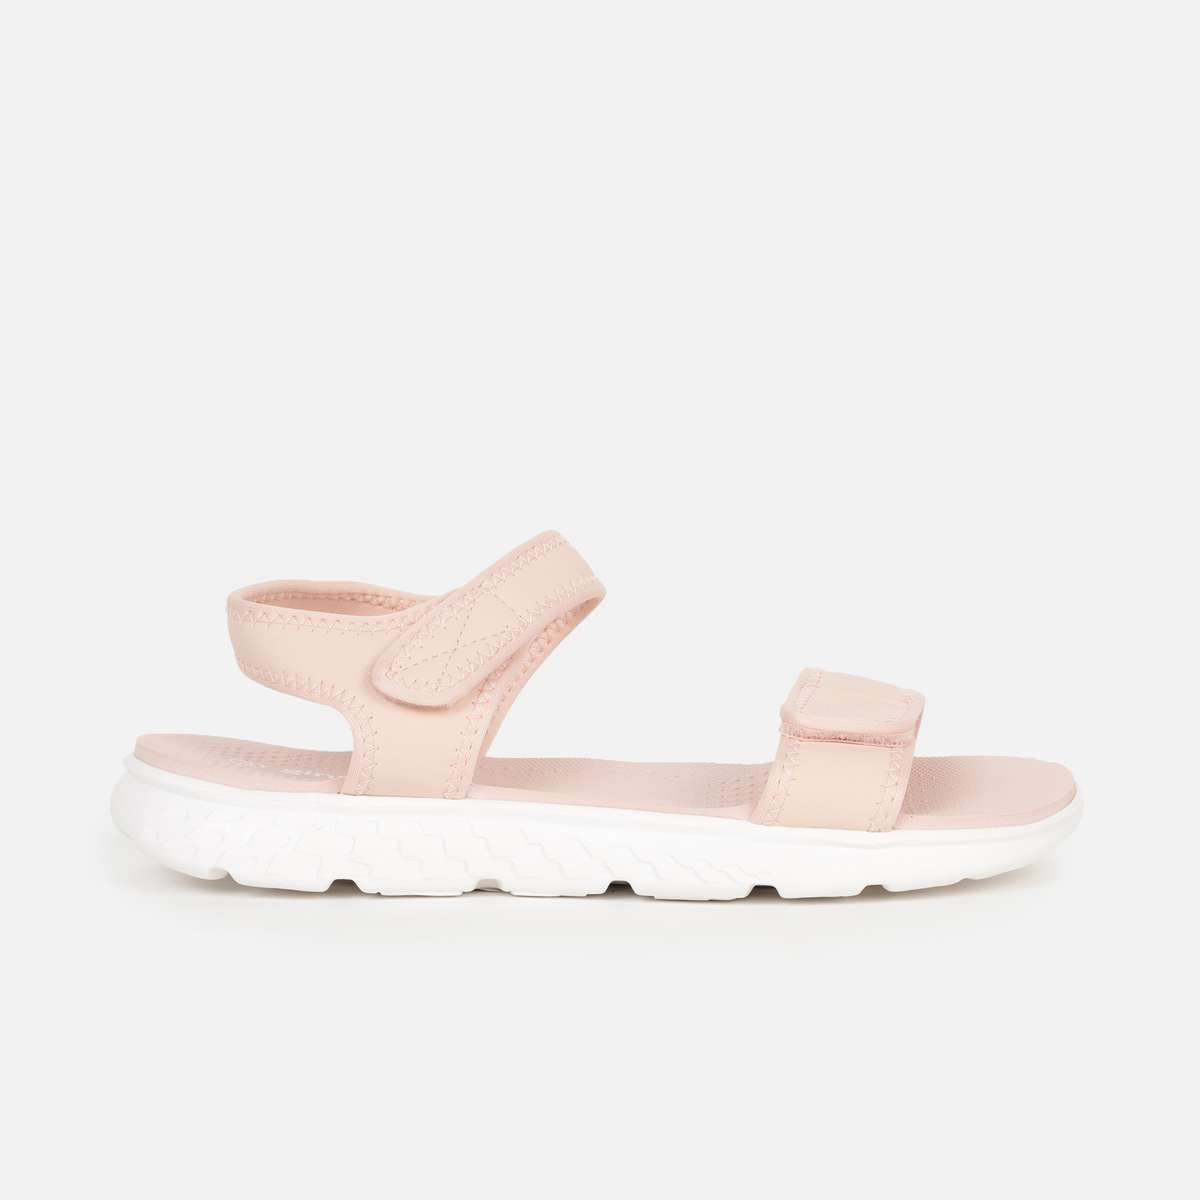 GINGER Women Solid Sandals